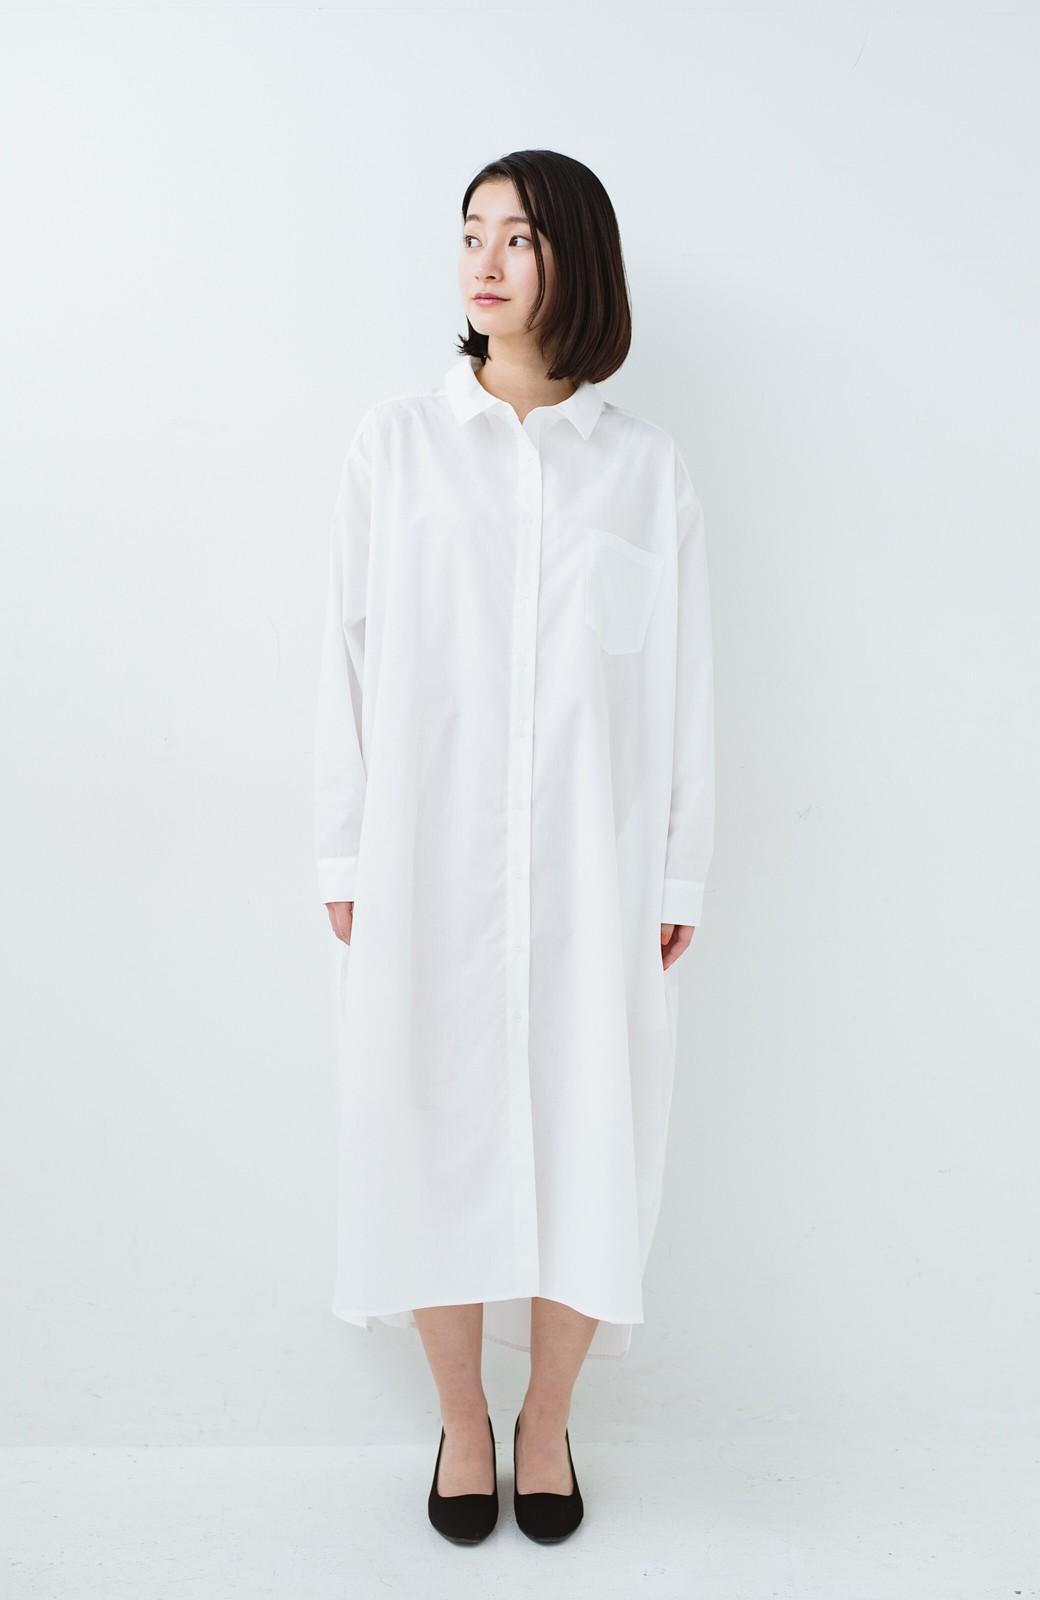 haco! 気持ちが凛と改まる リボン付きオーバーサイズシャツワンピース <ホワイト>の商品写真7